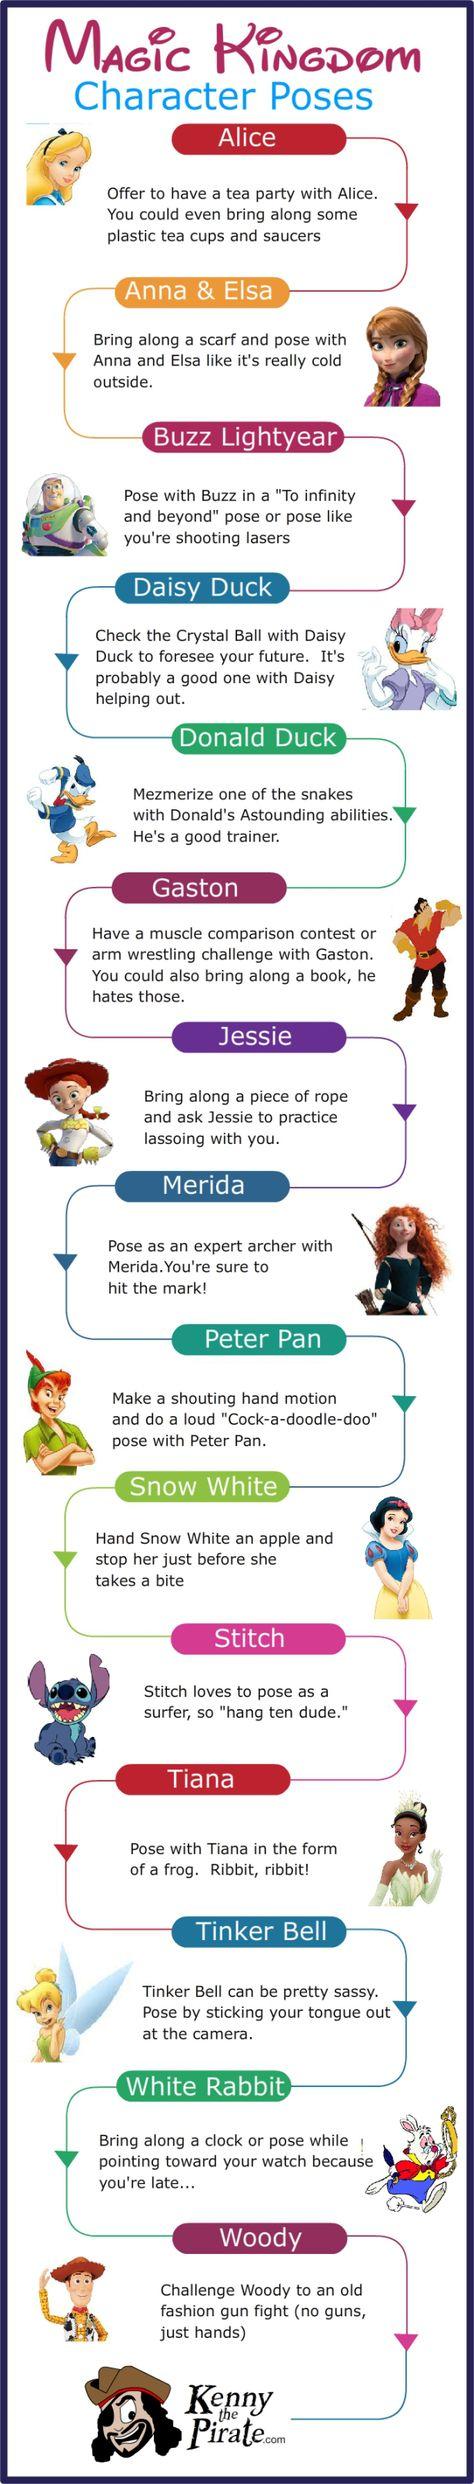 KennythePirate Poses for Magic Kingdom Disney World Character Photos